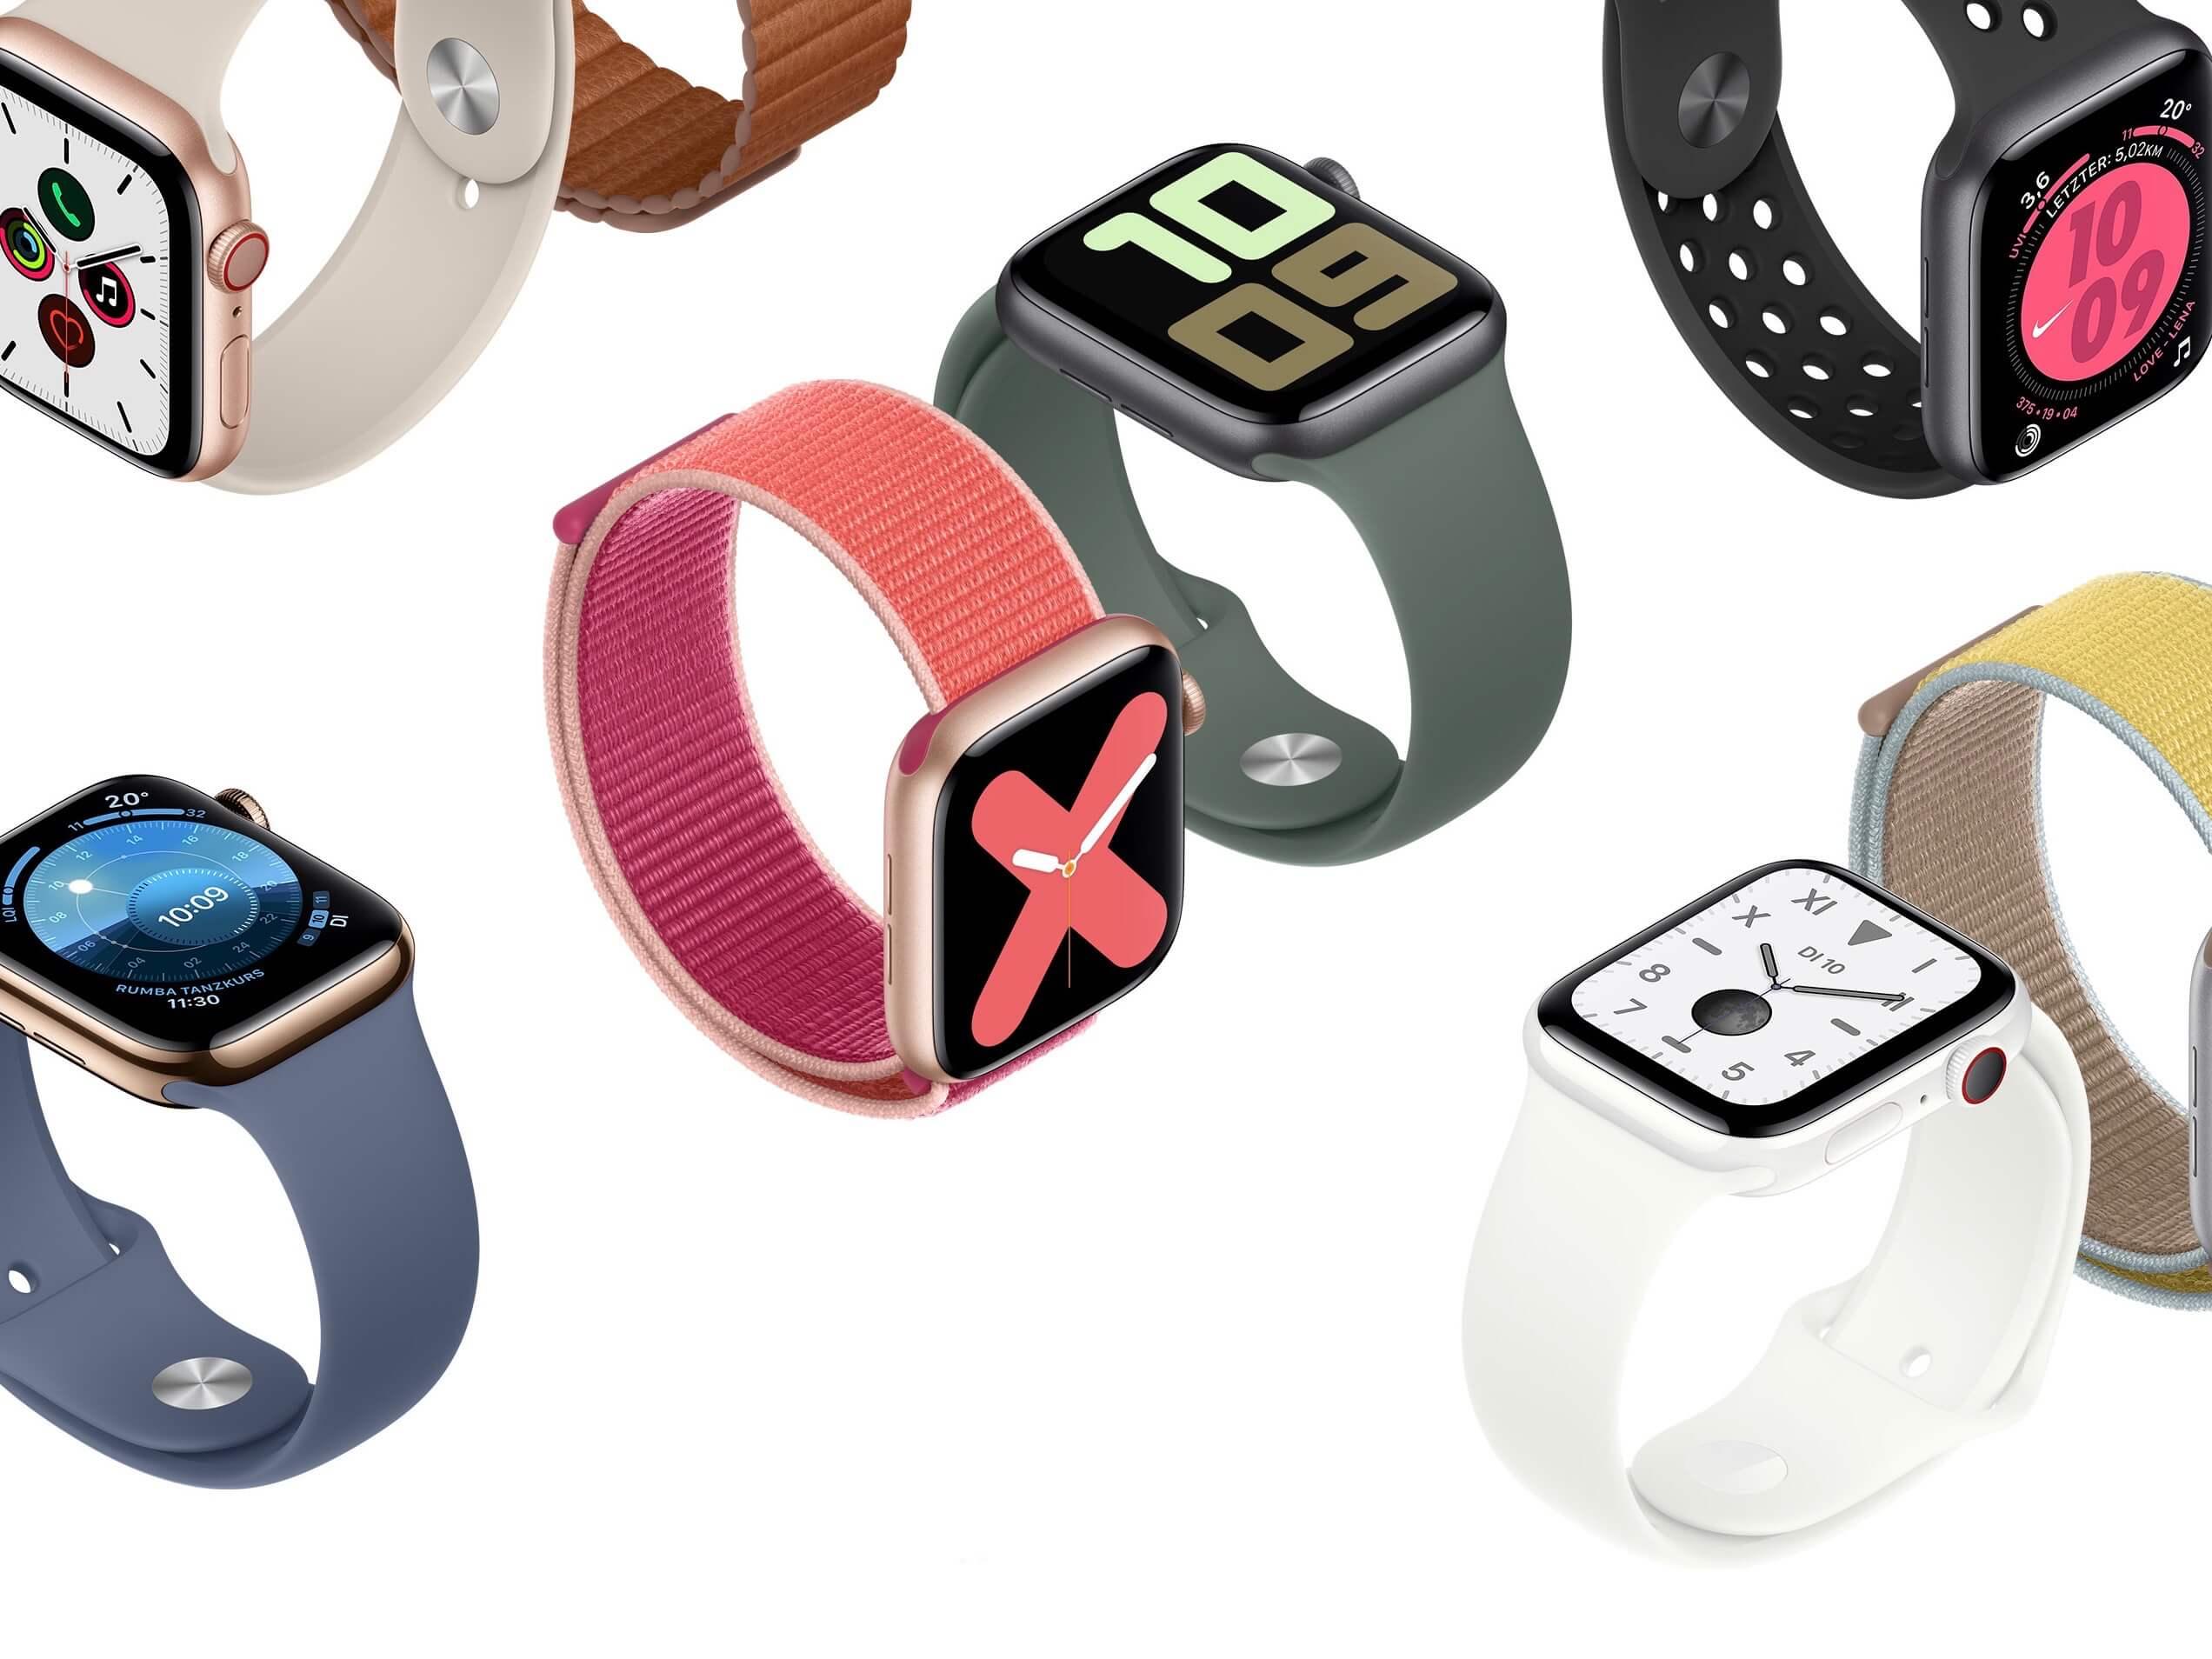 Apple Watch Titan vs. Apple Watch Aluminium